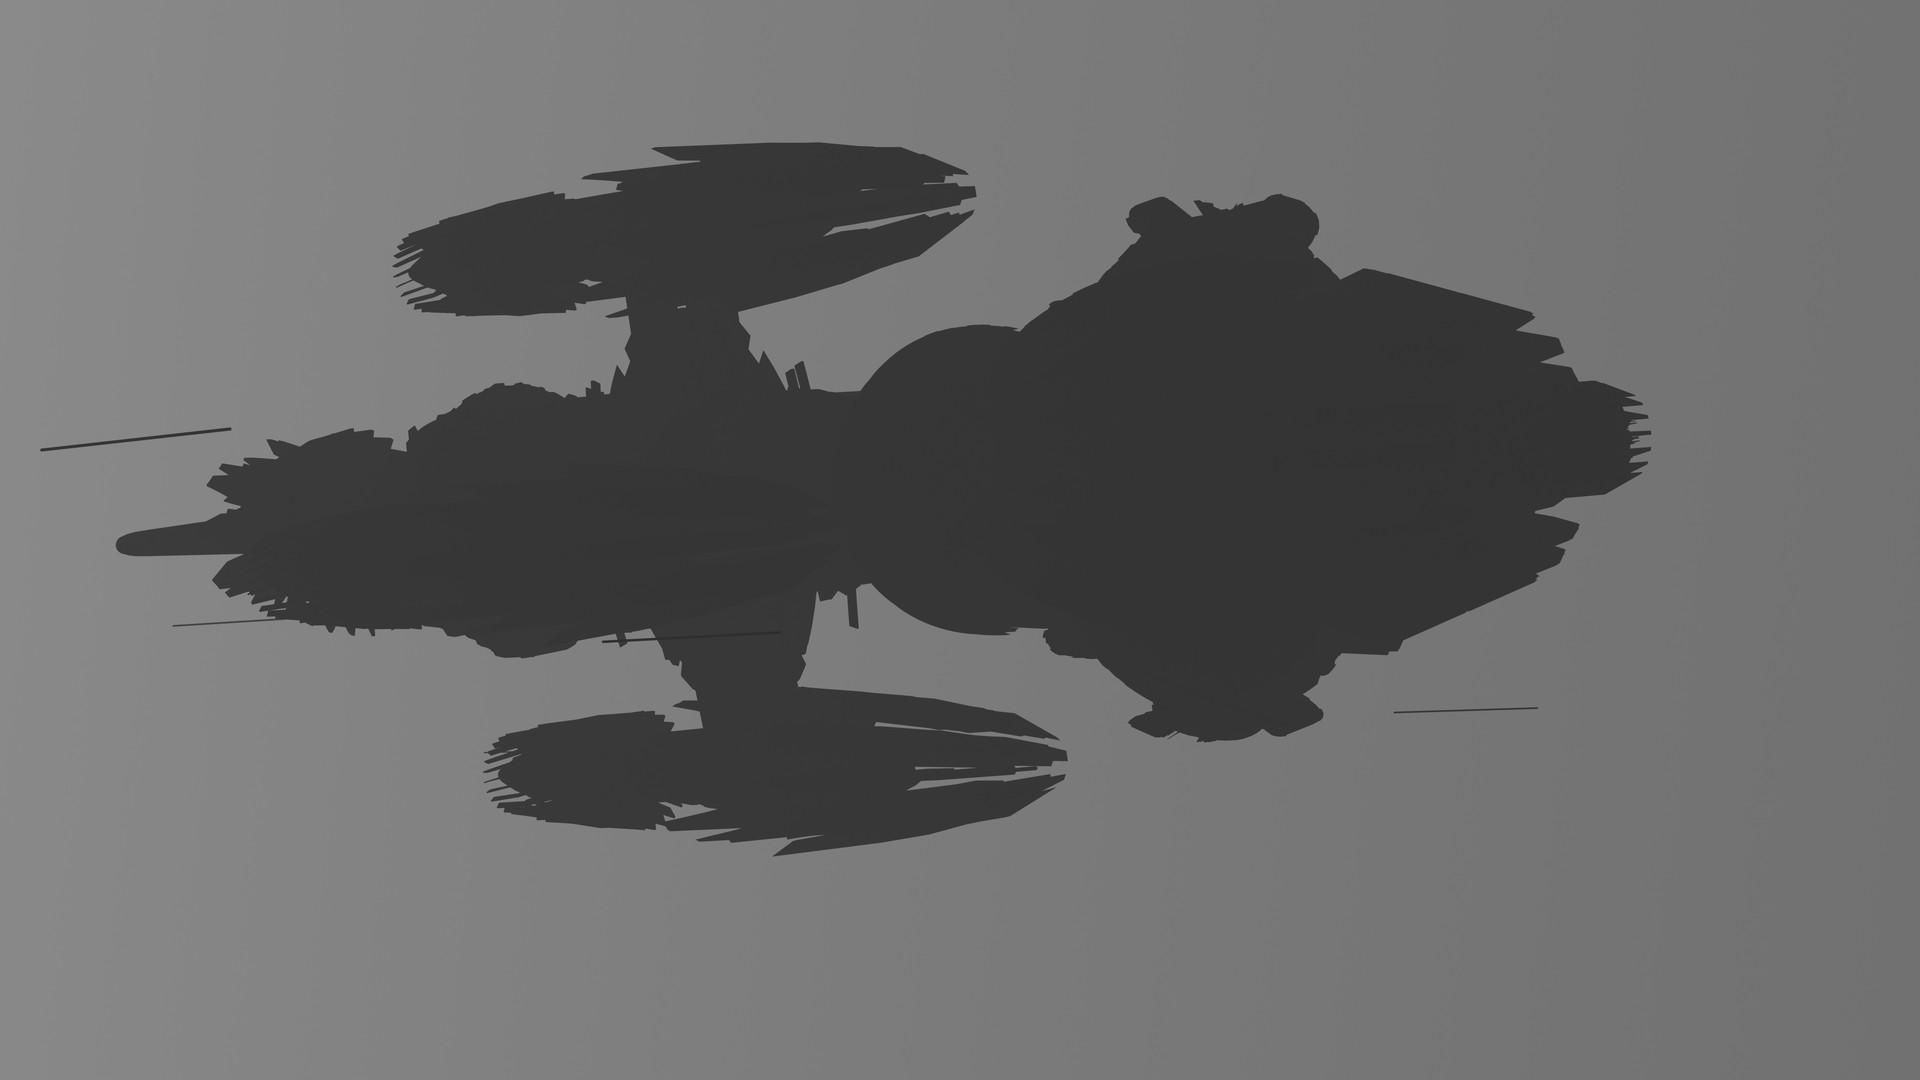 Kresimir jelusic robob3ar 245 140616 starship z